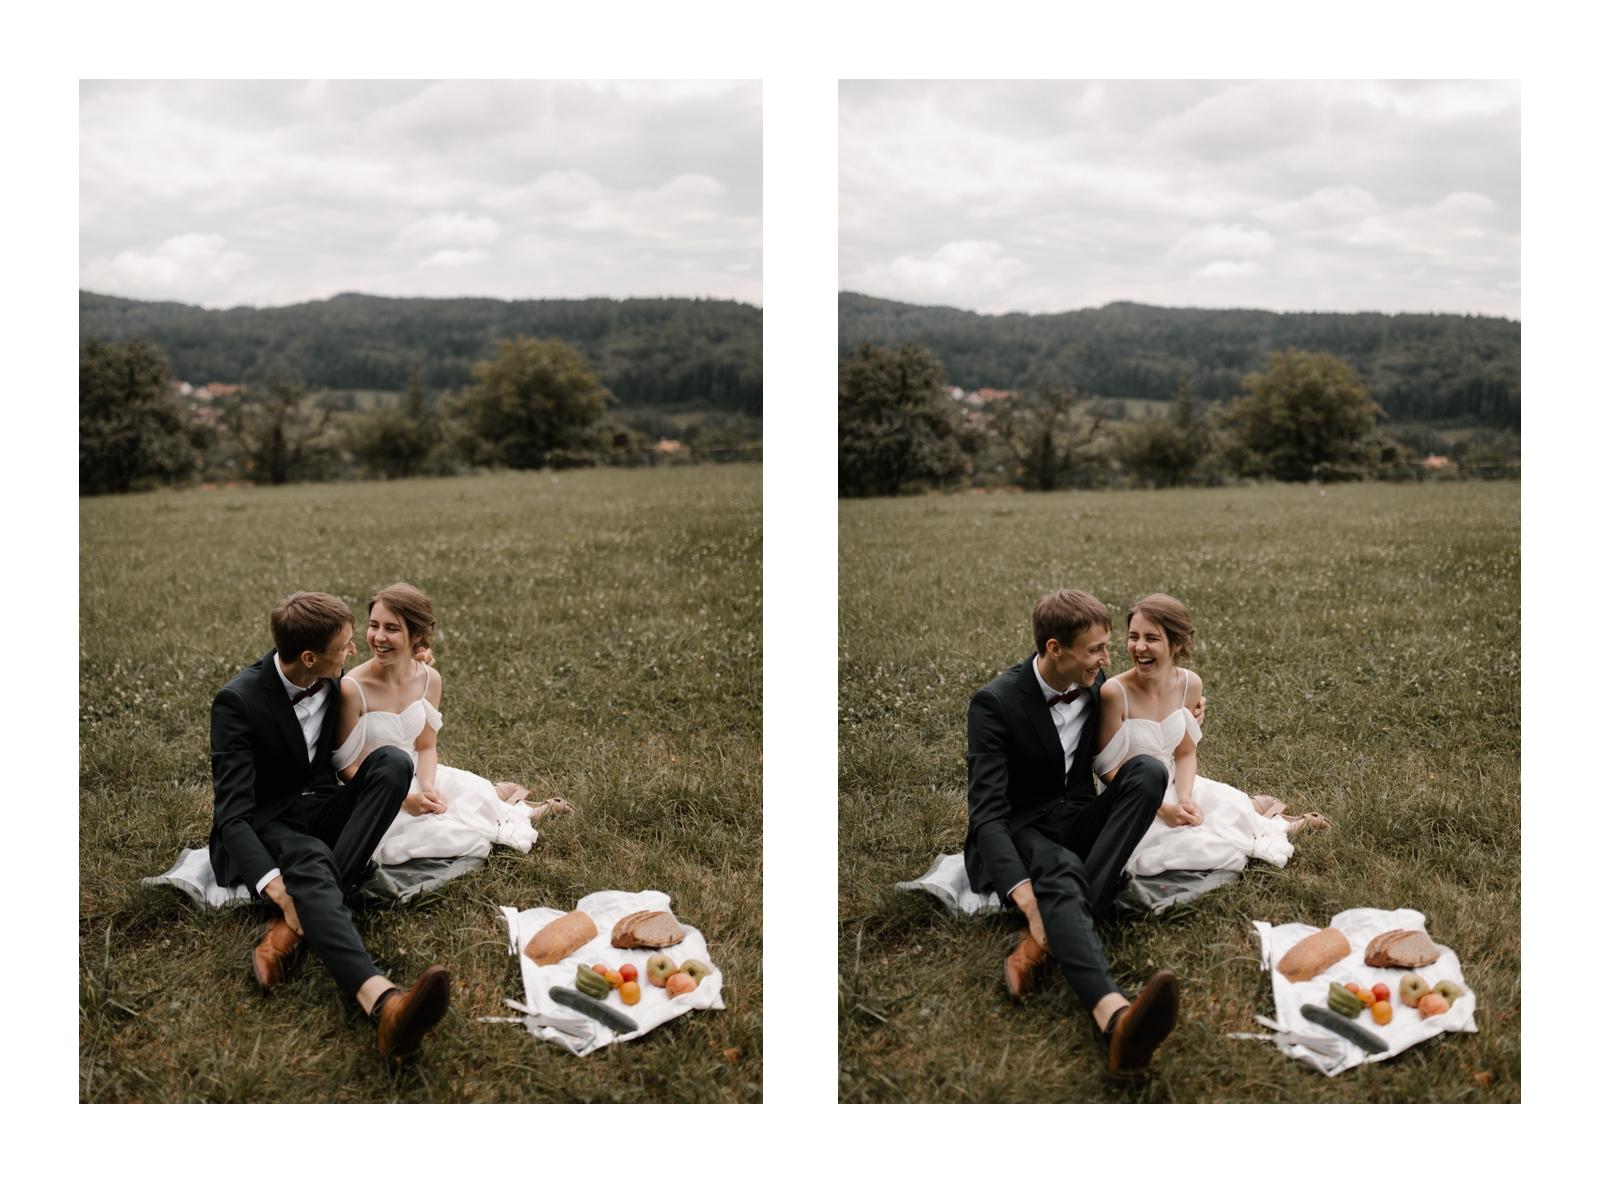 mirjam_thomas_wedding-213.jpg